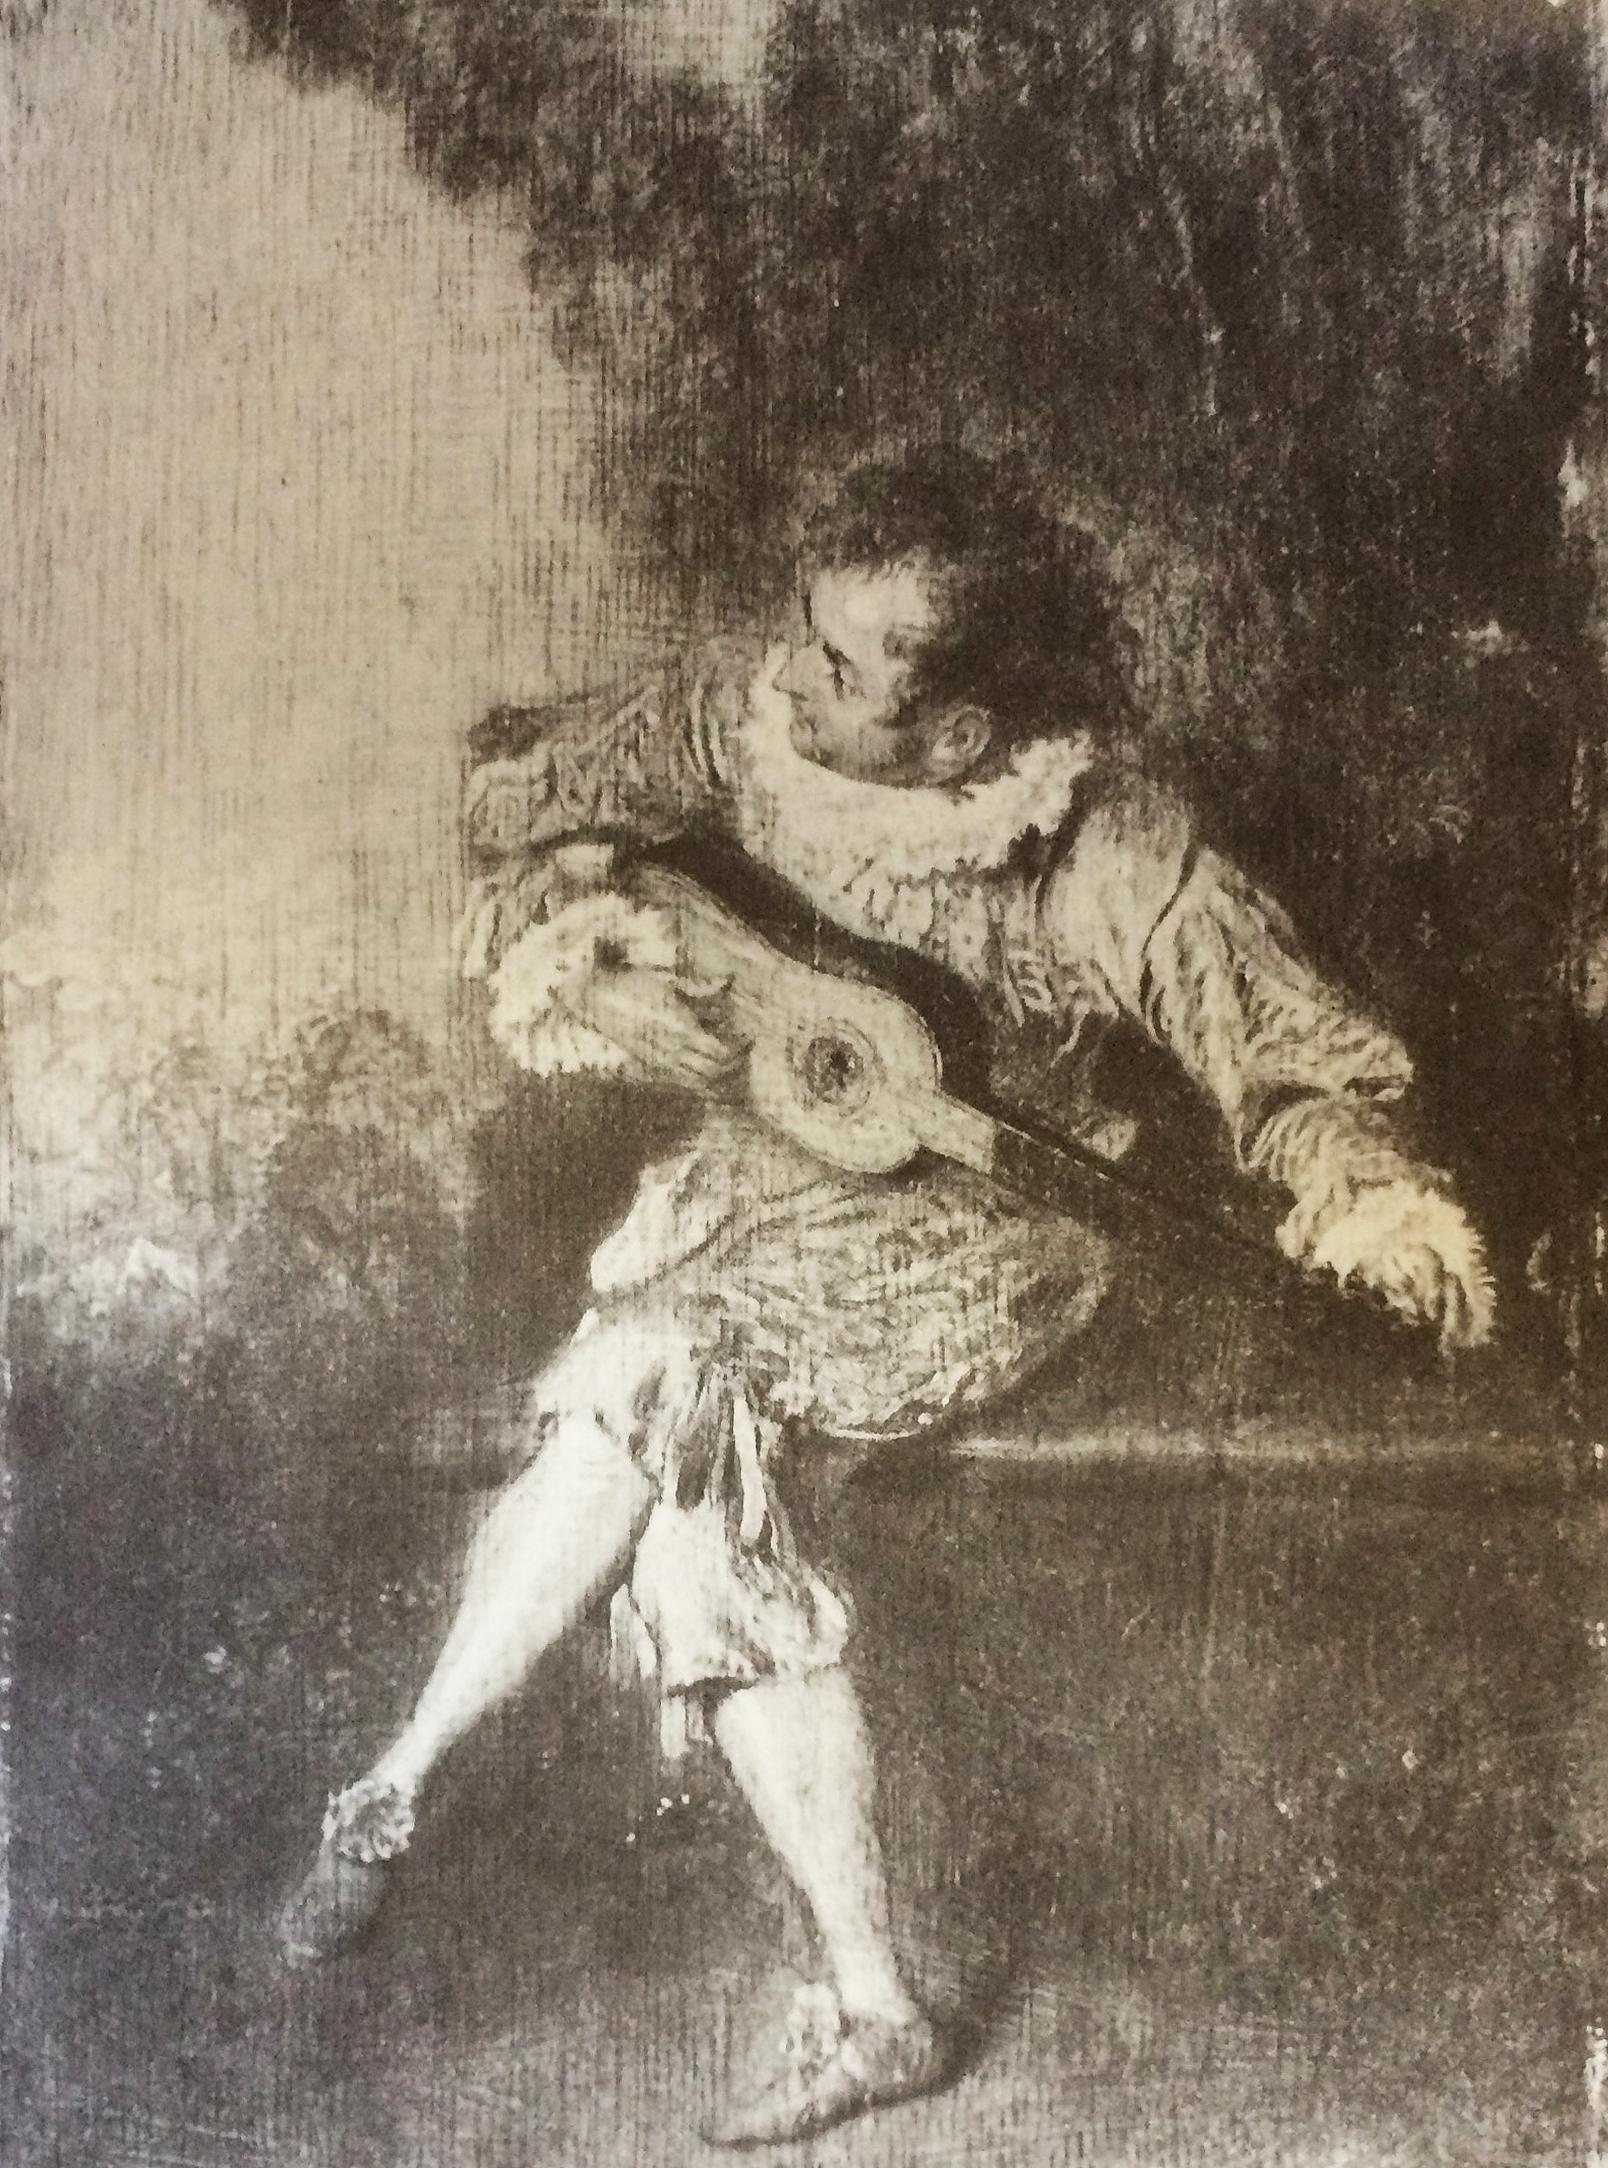 Watteau, Lute Player drawing 3